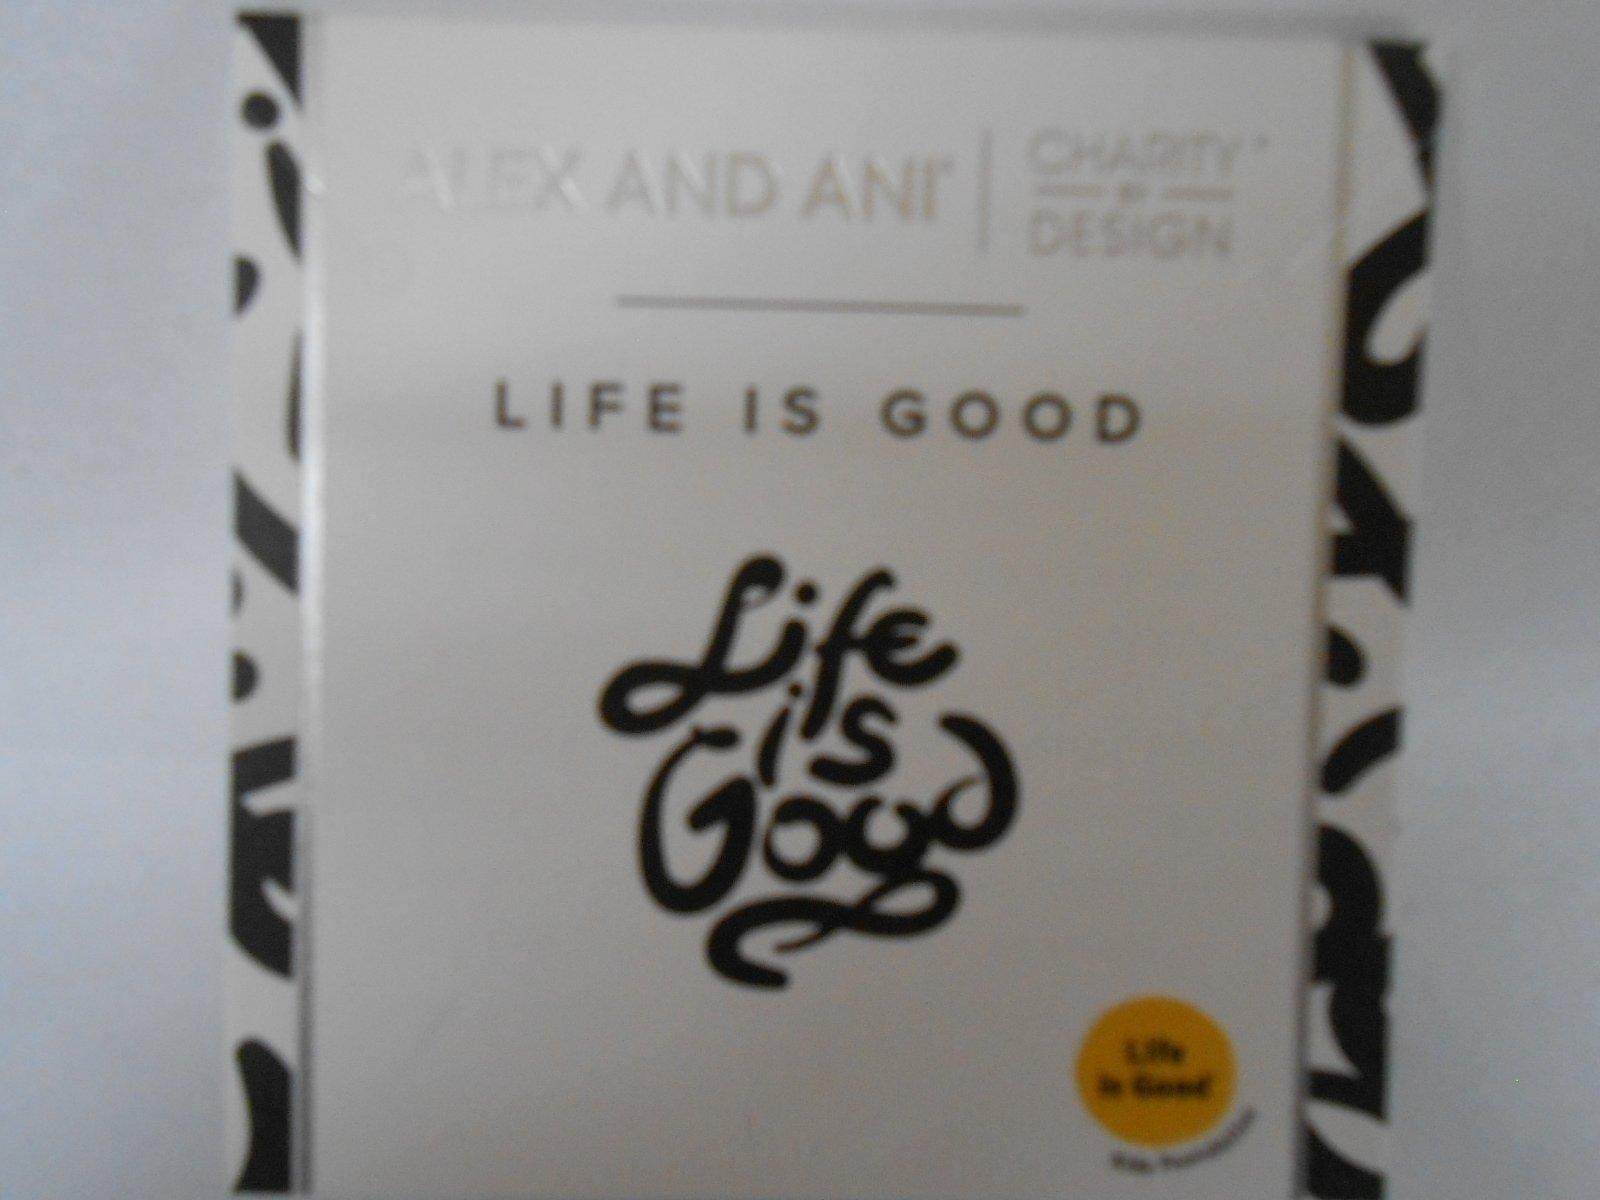 Alex and Ani LIFE IS GOOD Bangle Bracelet Shiny Silver NWTBC